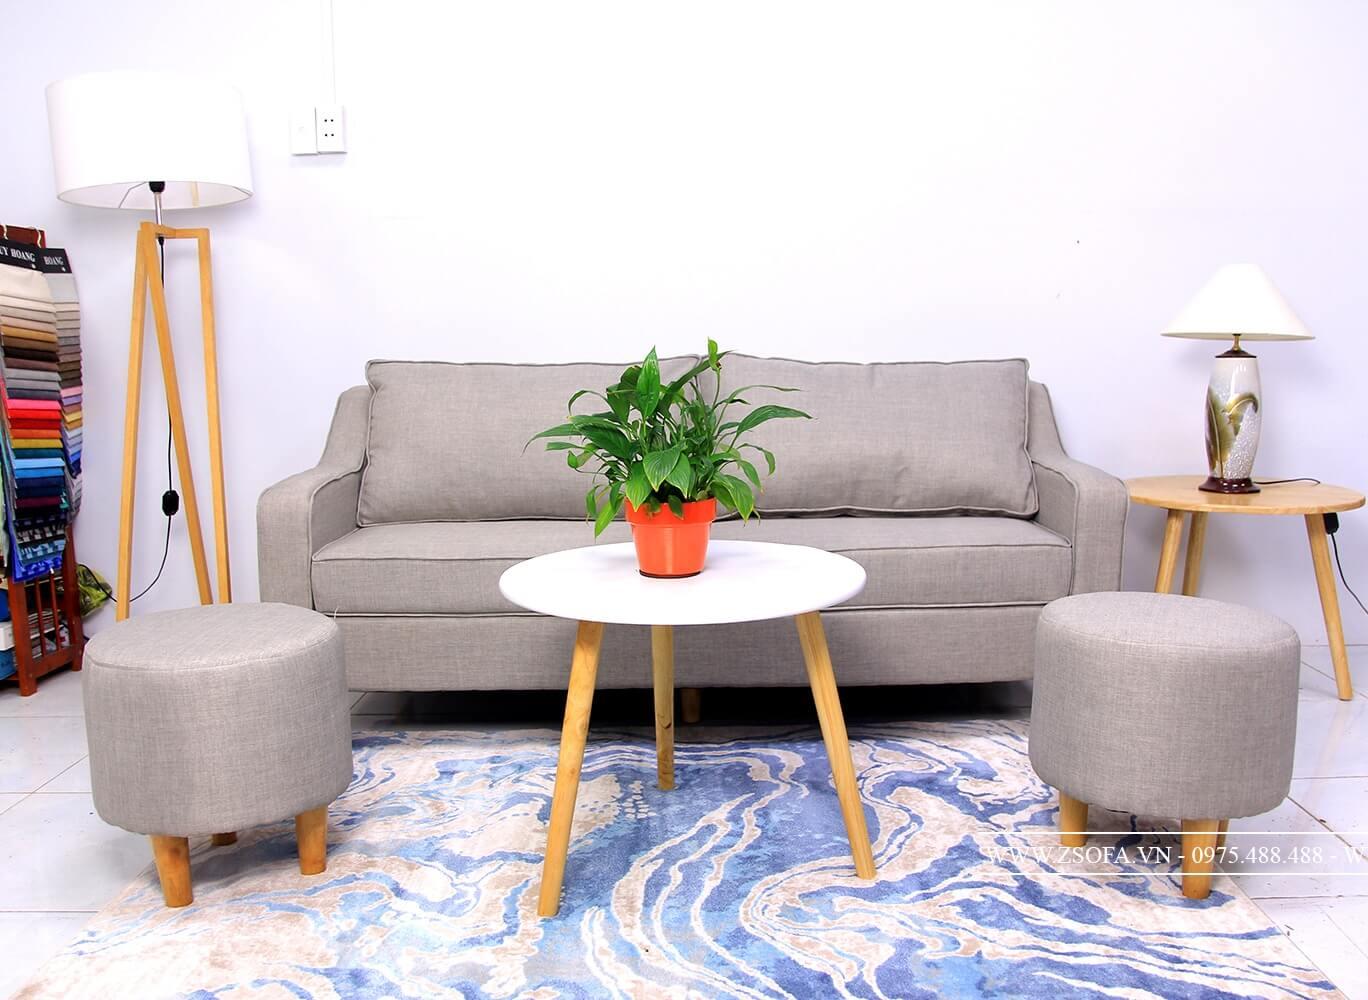 zSofa - mua thảm sofa ở đâu TPHCM